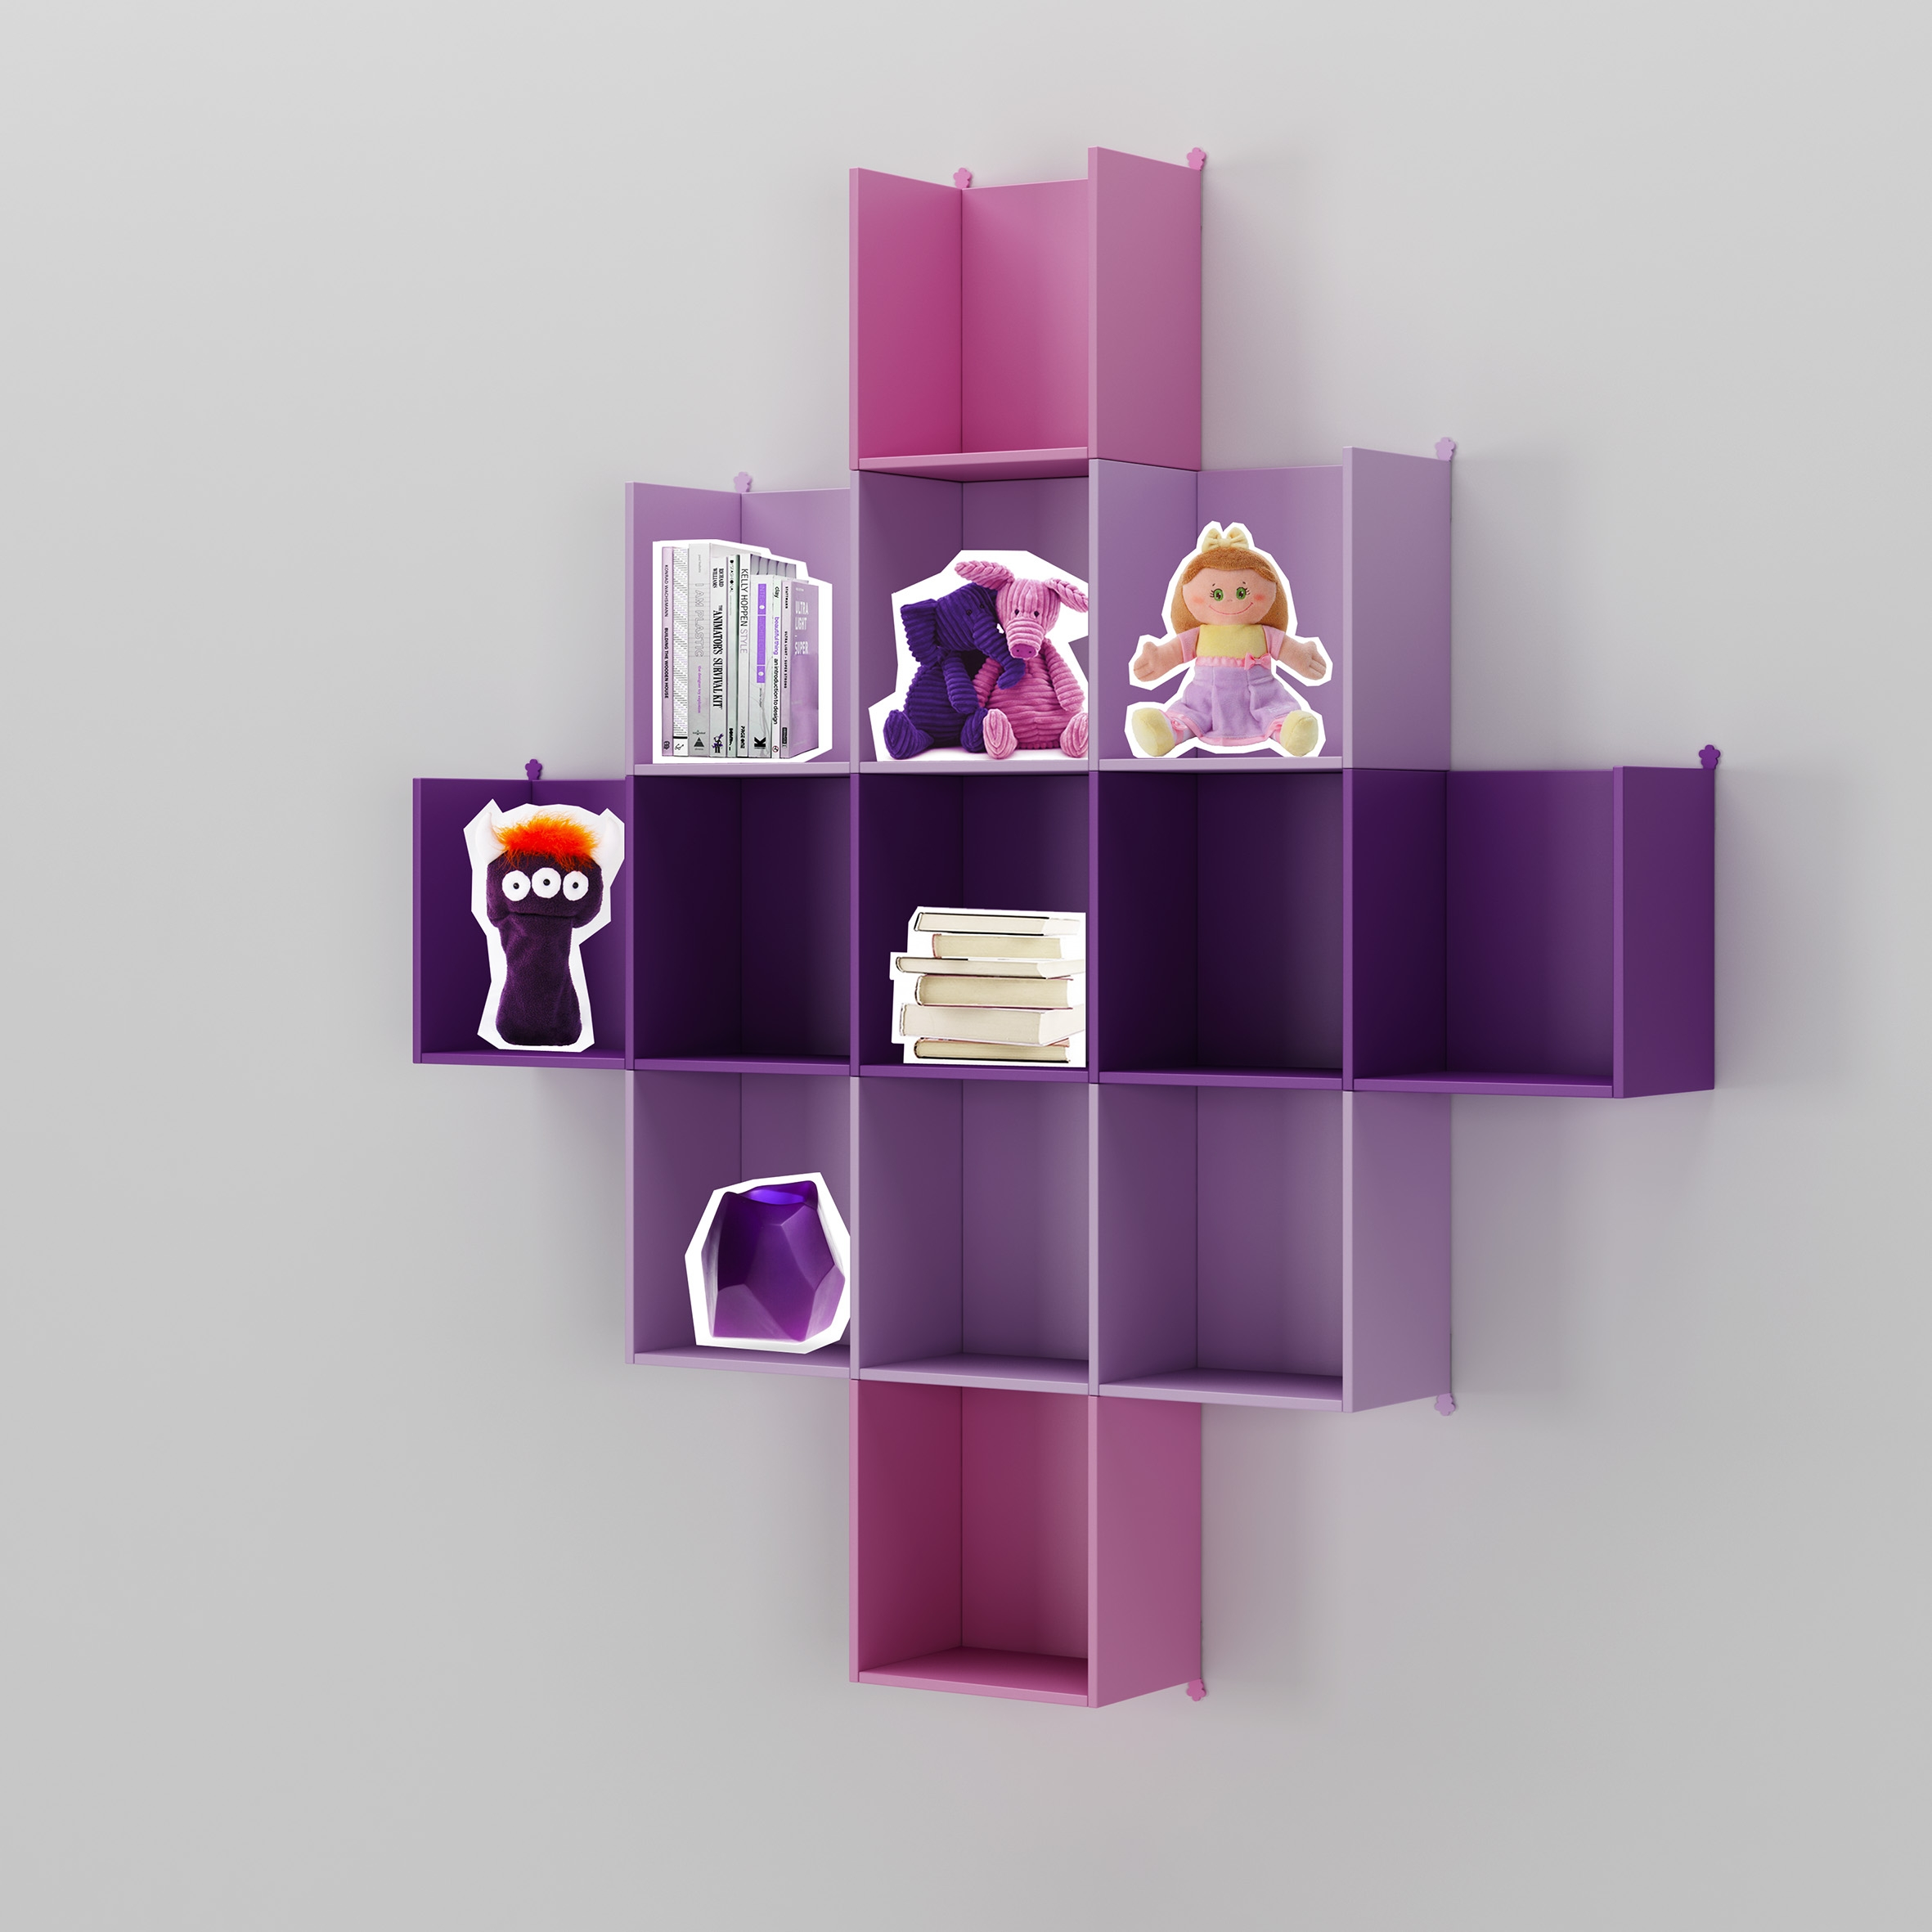 Meuble bibliothèque PERSONNALISABLE WX001 ultra design - MORETTI COMPACT